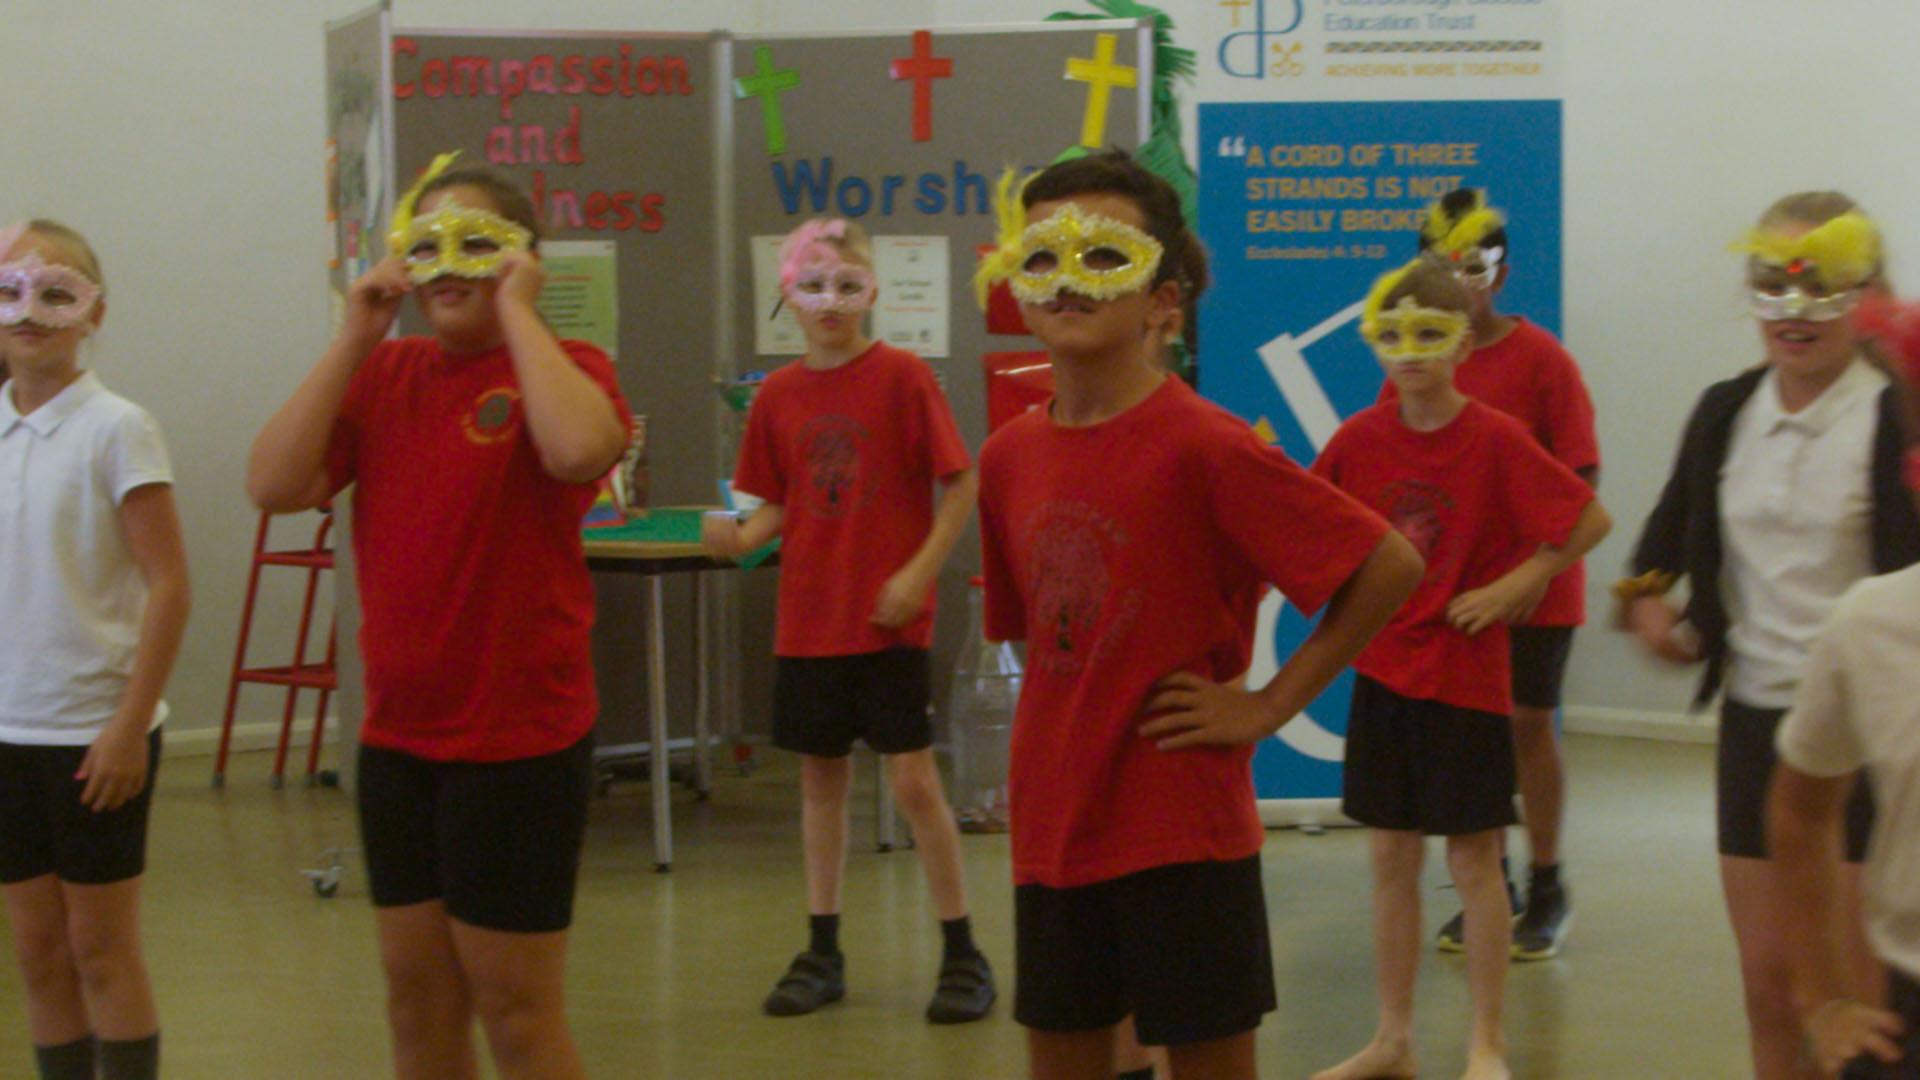 School children wearing dance masks for South American dance workshop